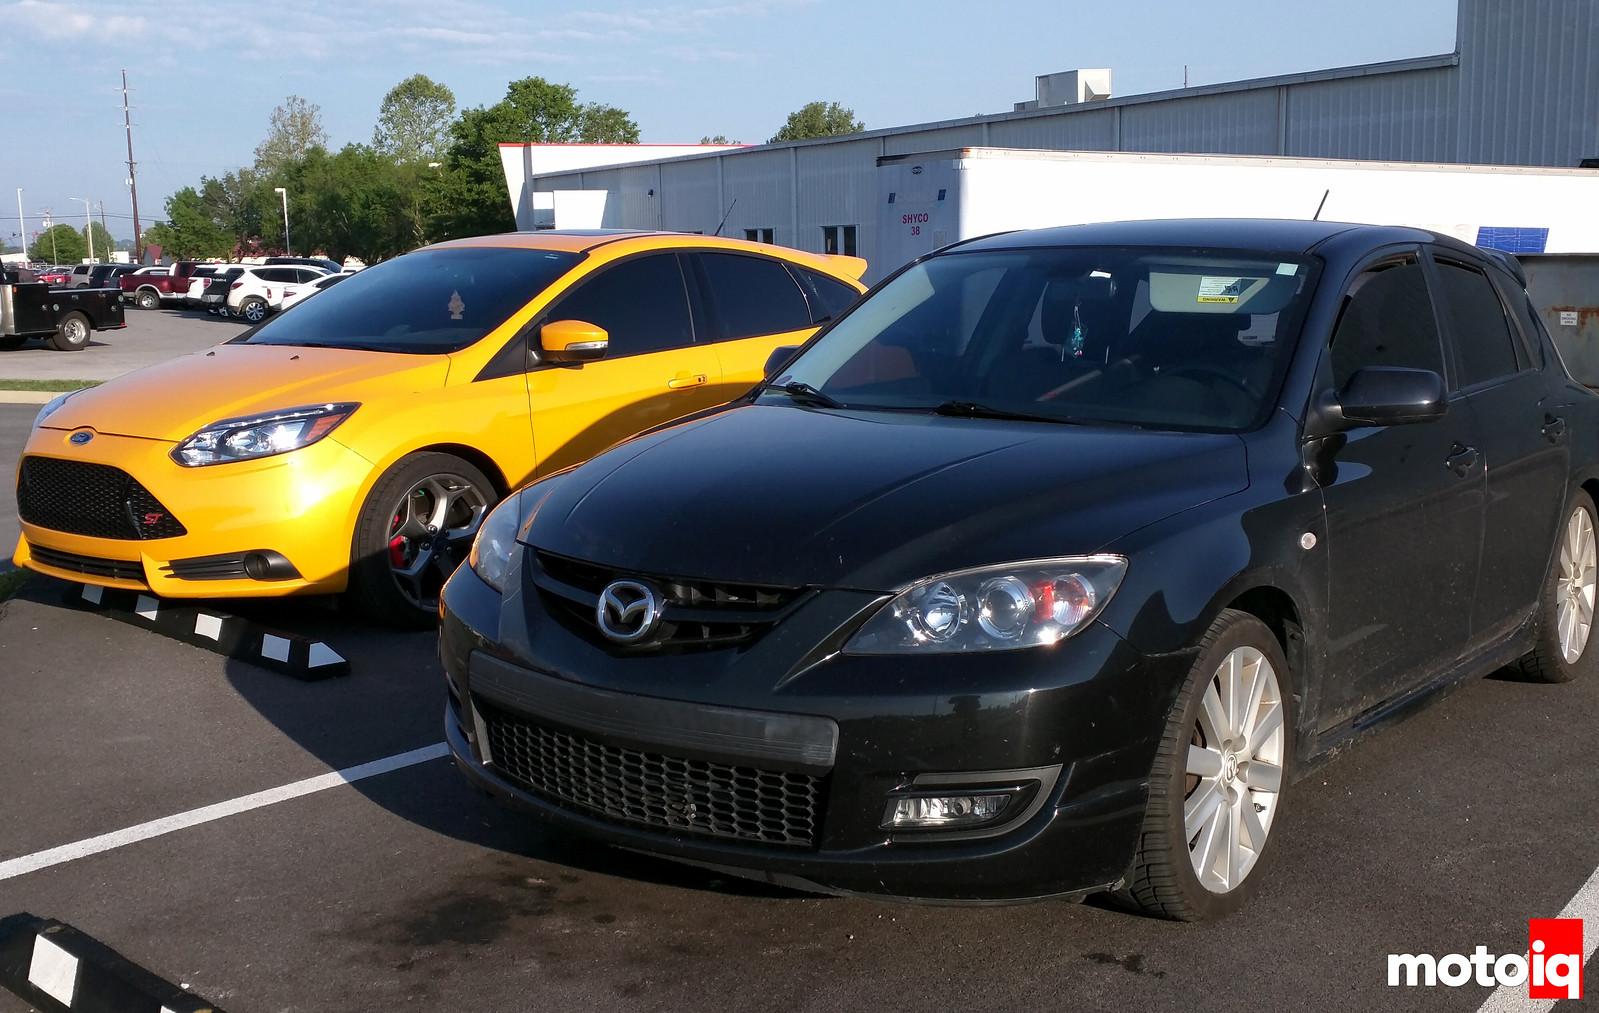 Project Mazdaspeed3: Building a Stock Class Cone Killer